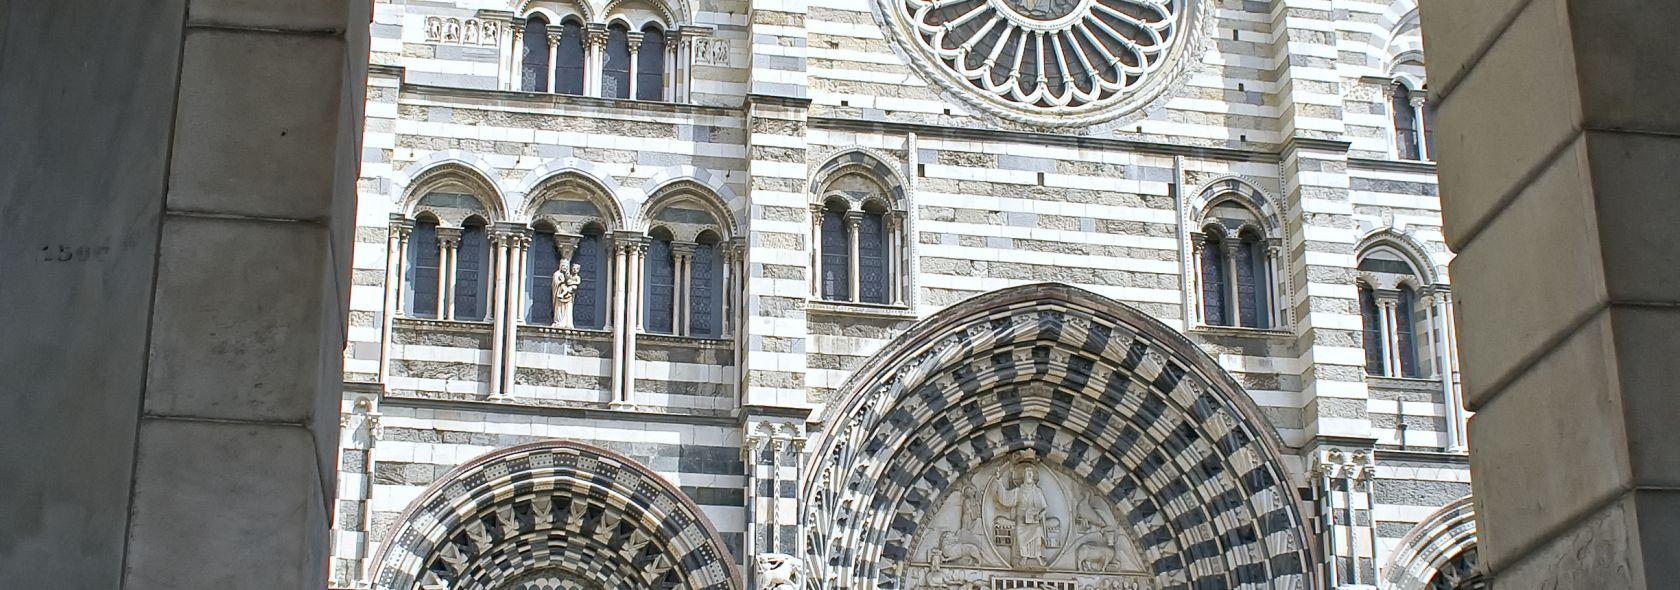 Cattedrale di San Lorenzo - Adobe Stock - Liguria Digitale